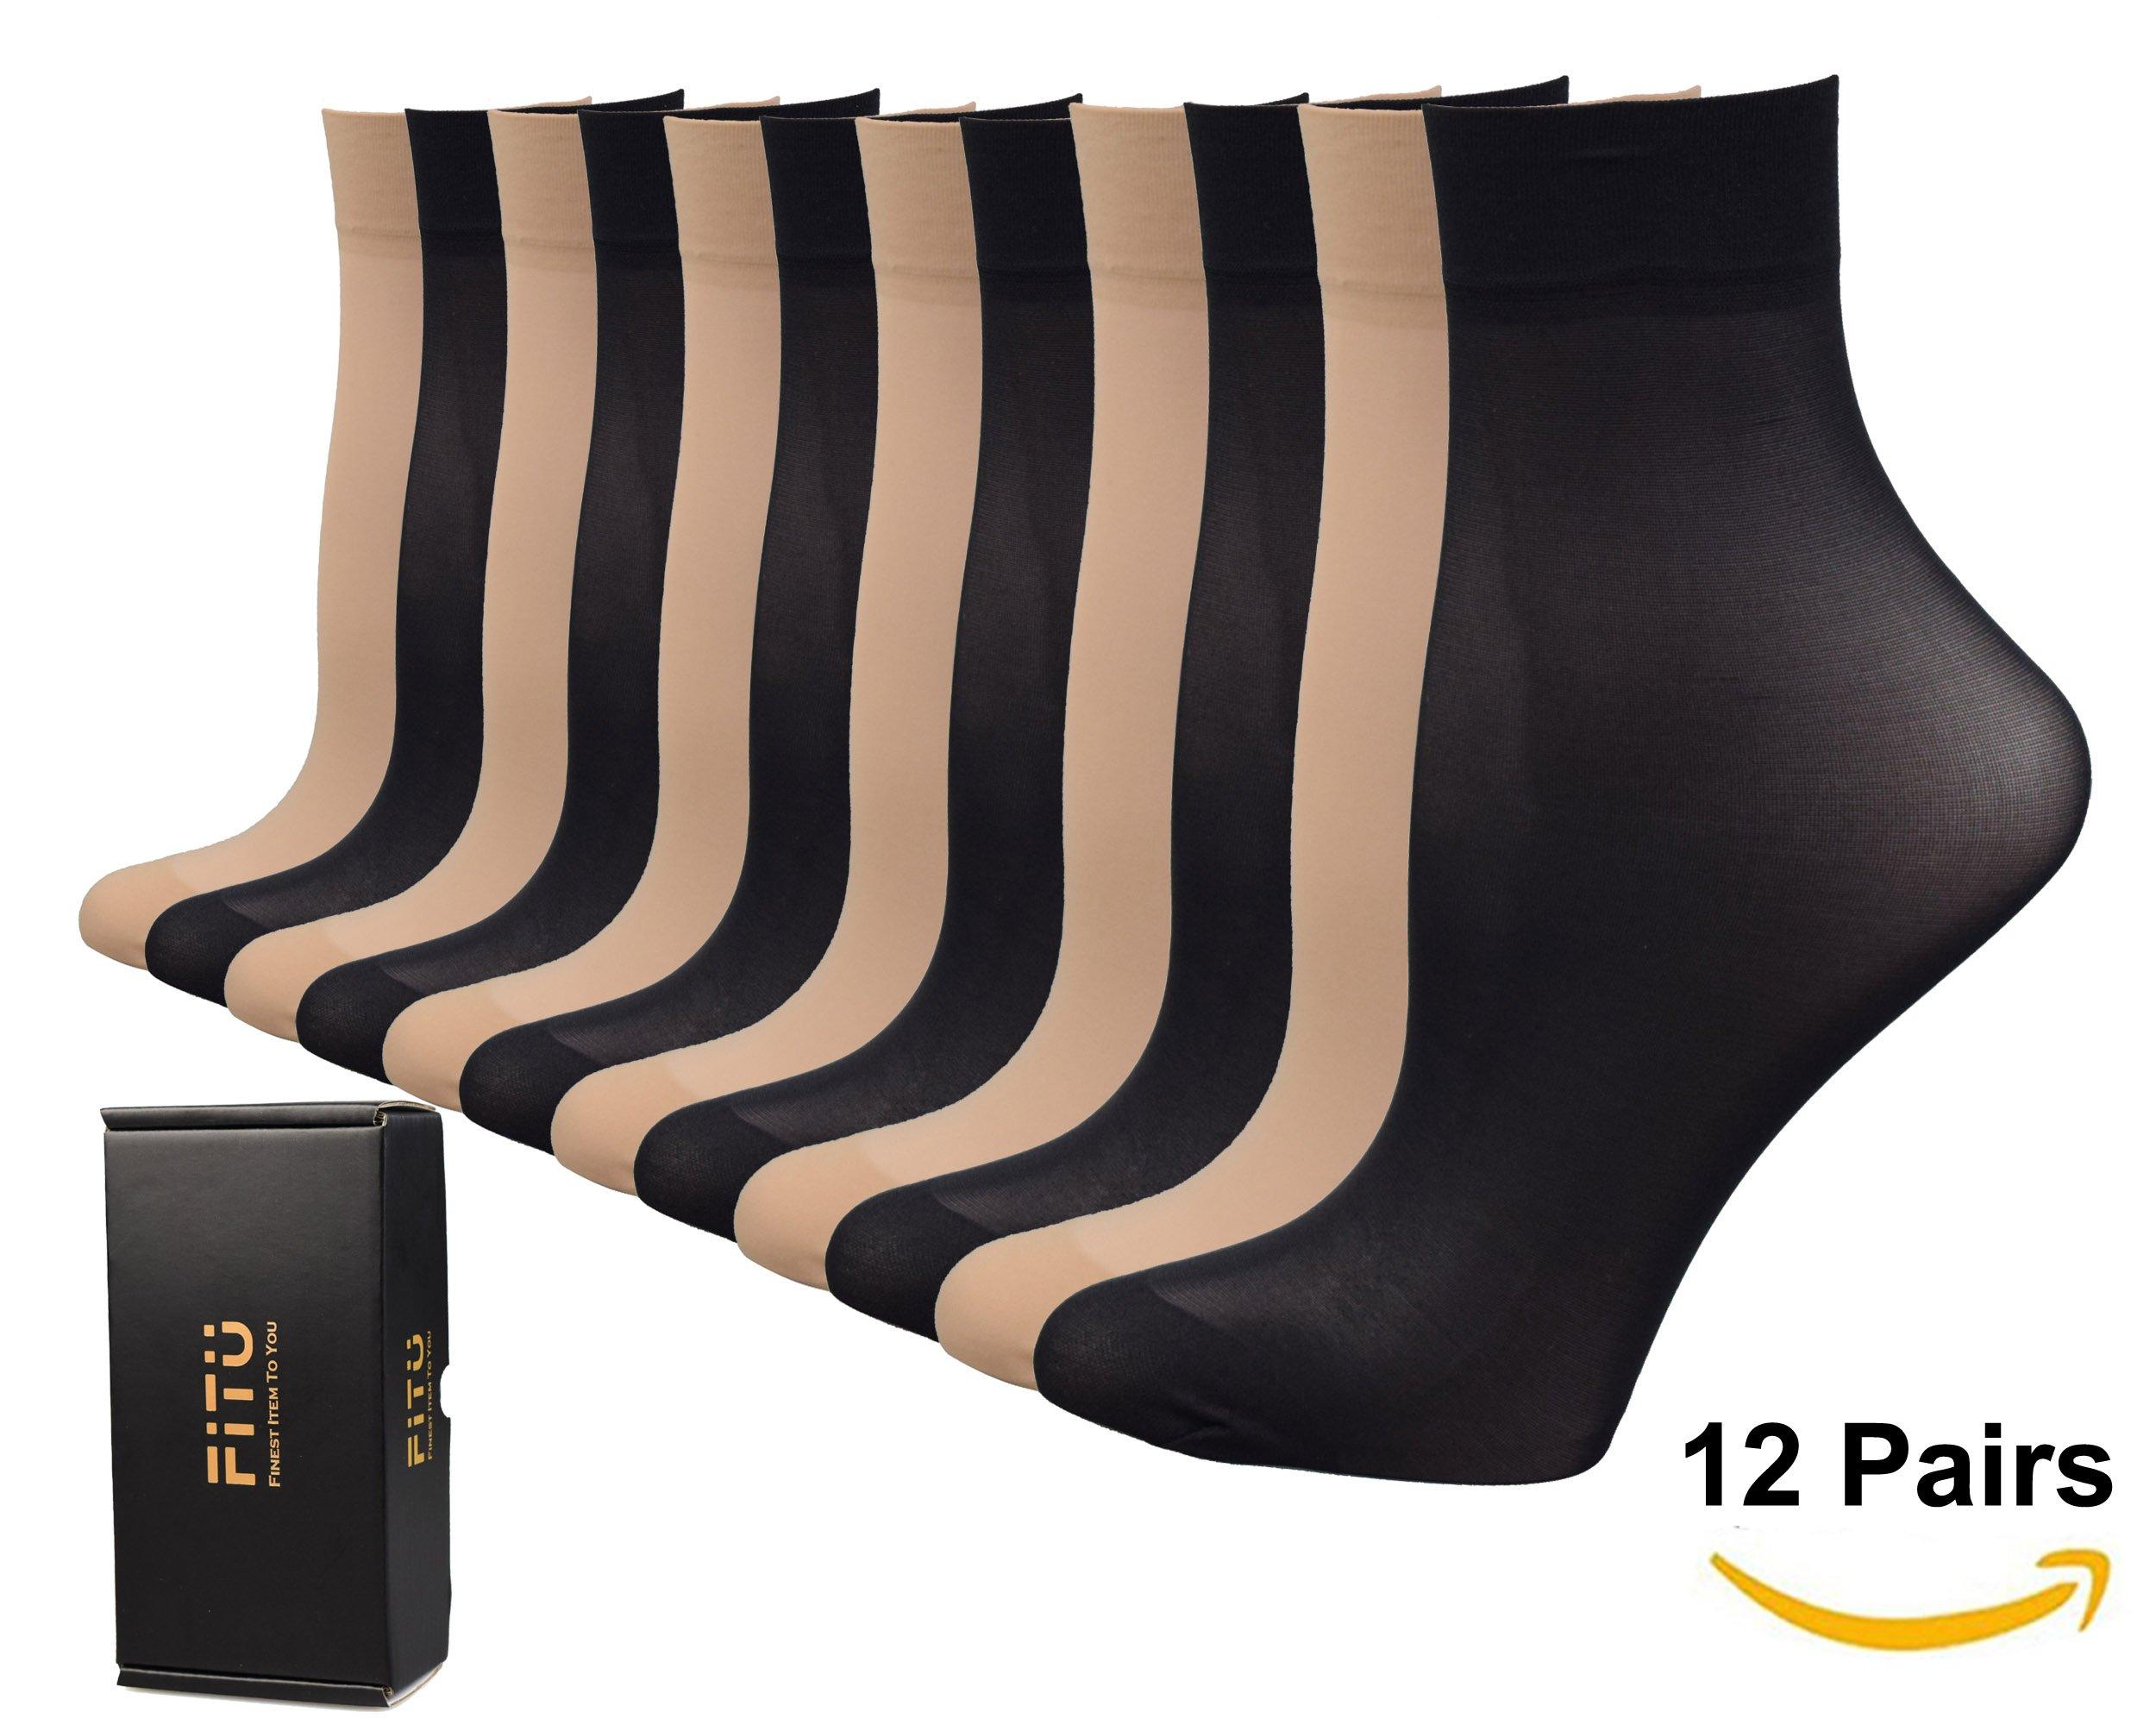 Fitu Women's 50D Extra Soft 12 Pairs Sheer Nylon Ankle High Tights Hosiery Socks (6 Black 6 Beige)